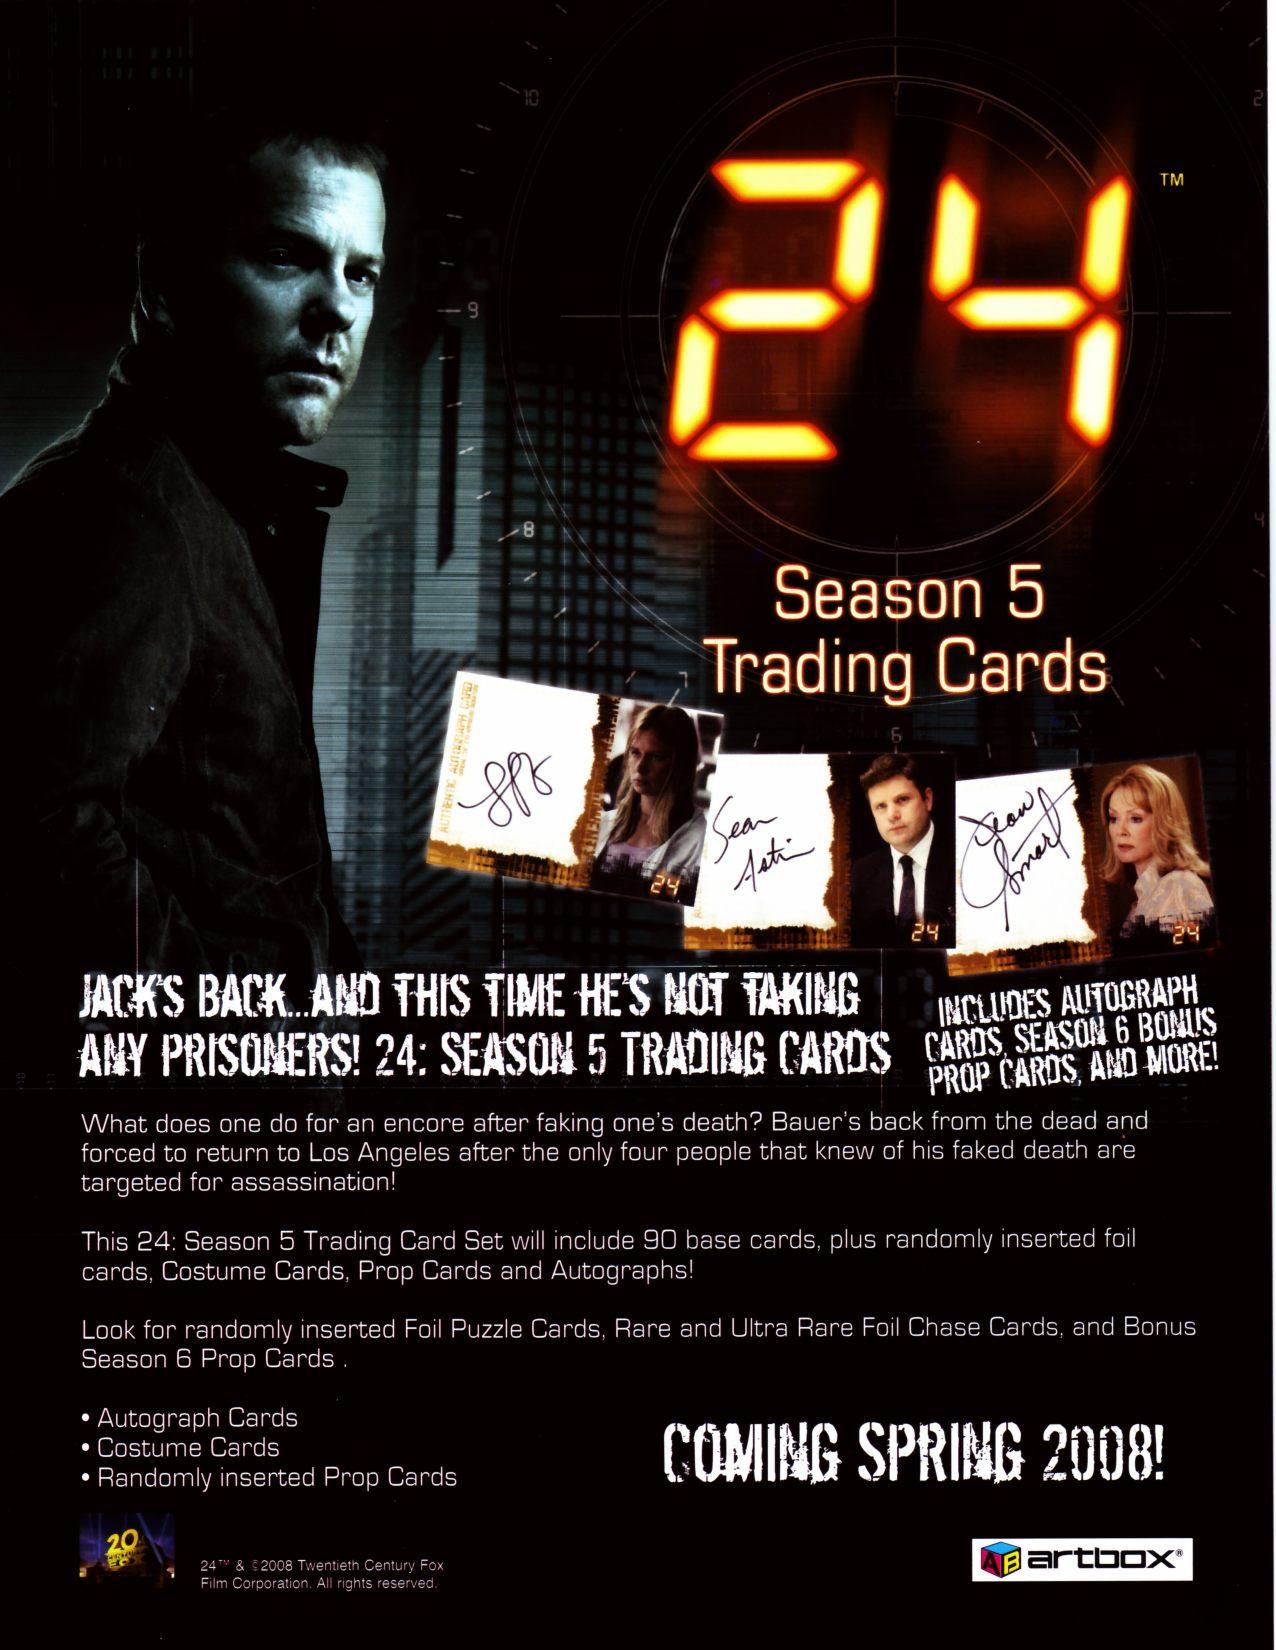 fotograf: 24 season 5